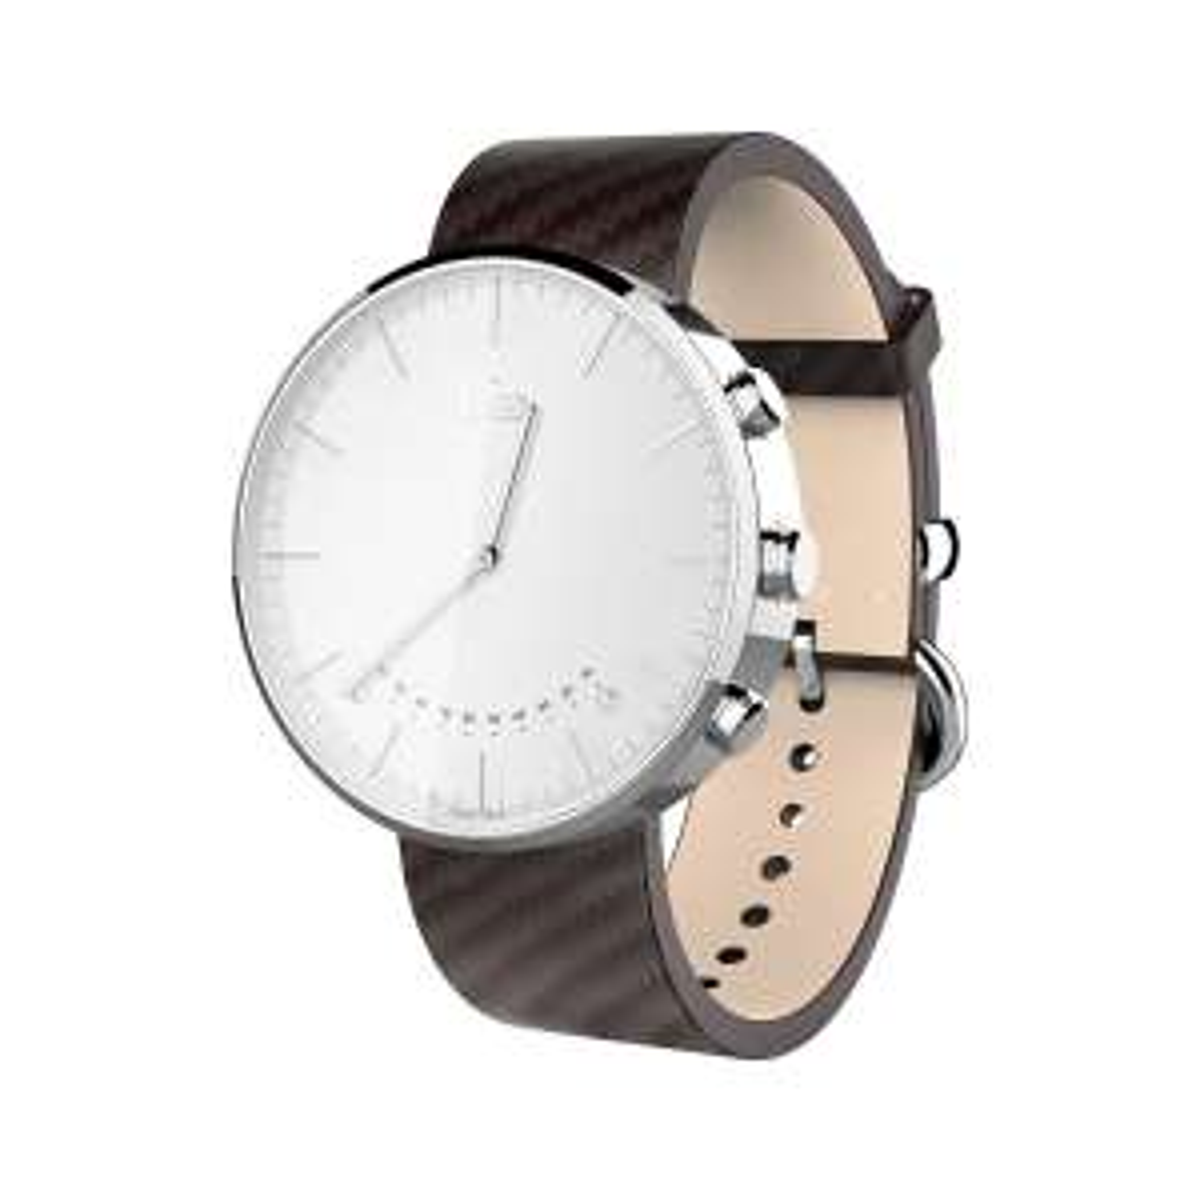 (Gearbest) Elephone W2 Bluetooth Smartwatch für 24,56€